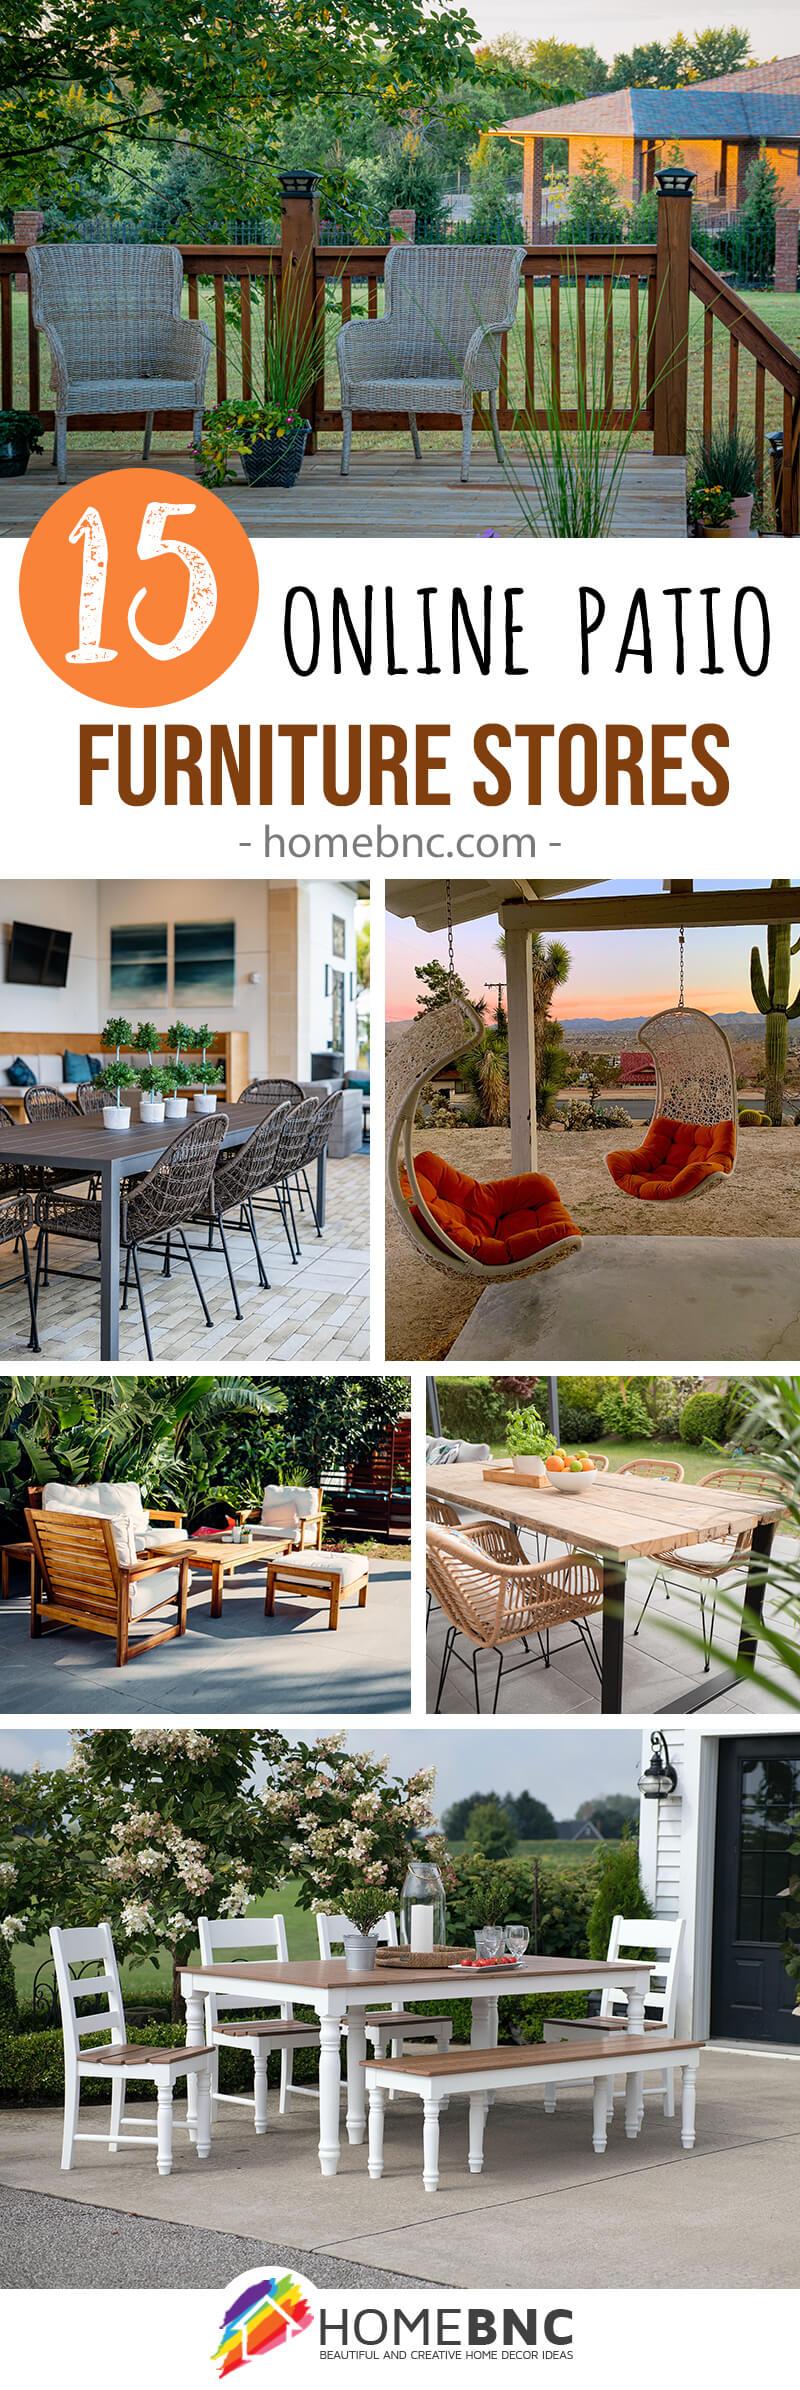 Best Online Patio Furniture Stores